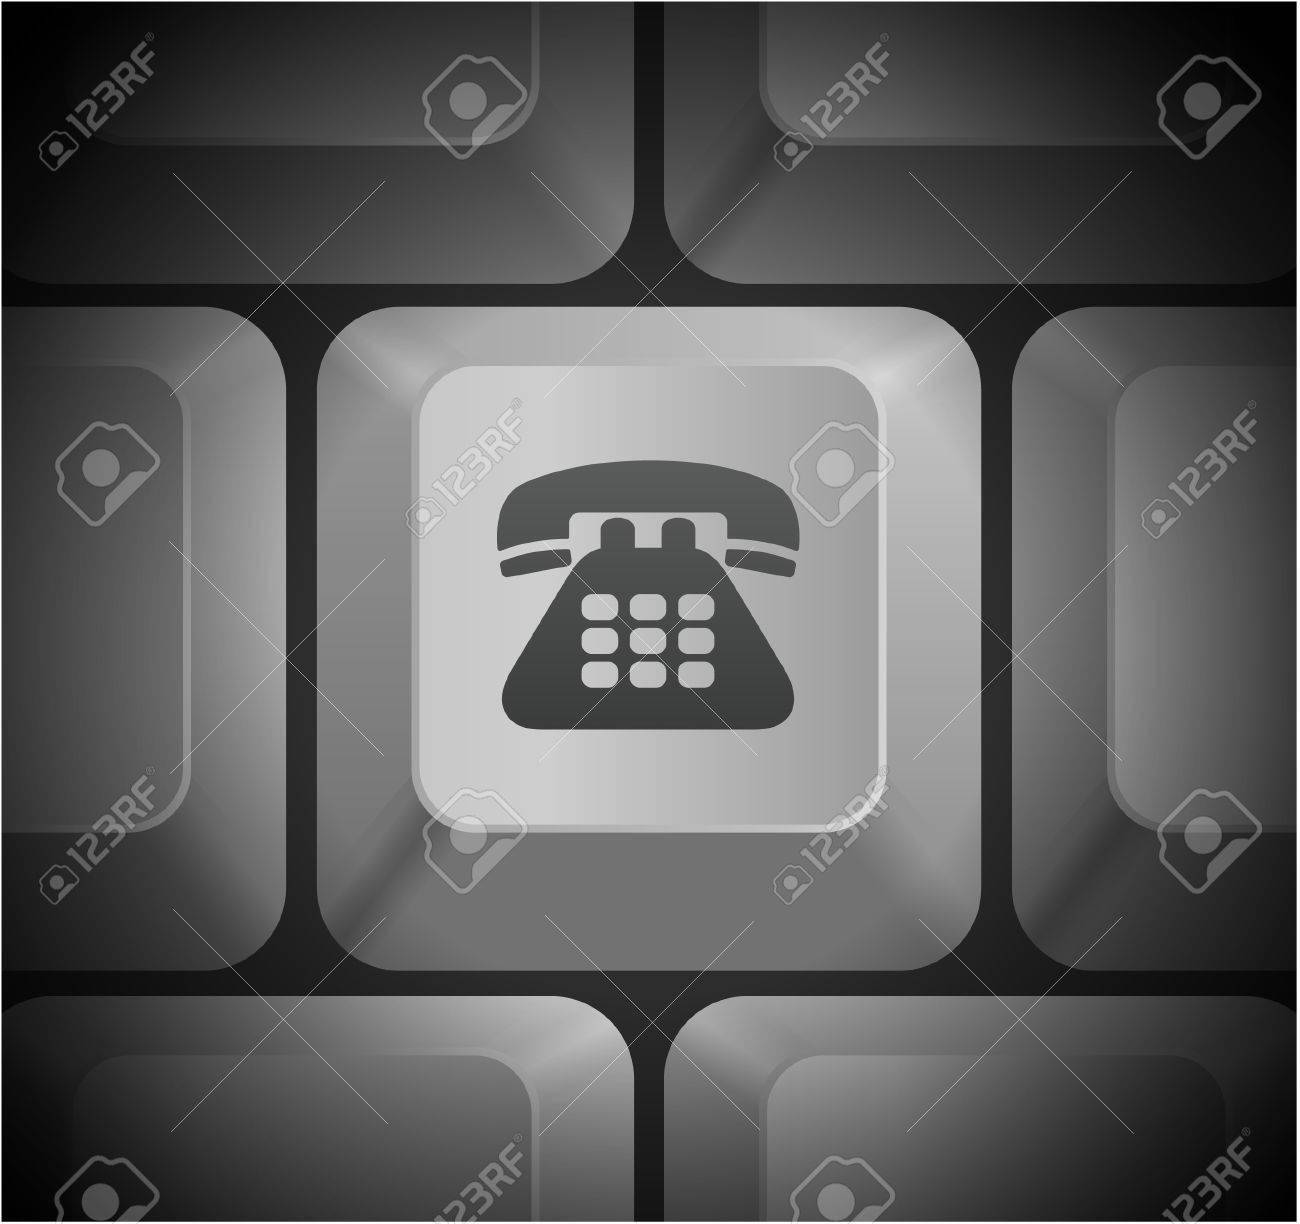 Telephone Icon On Computer Keyboard Original Illustration Royalty